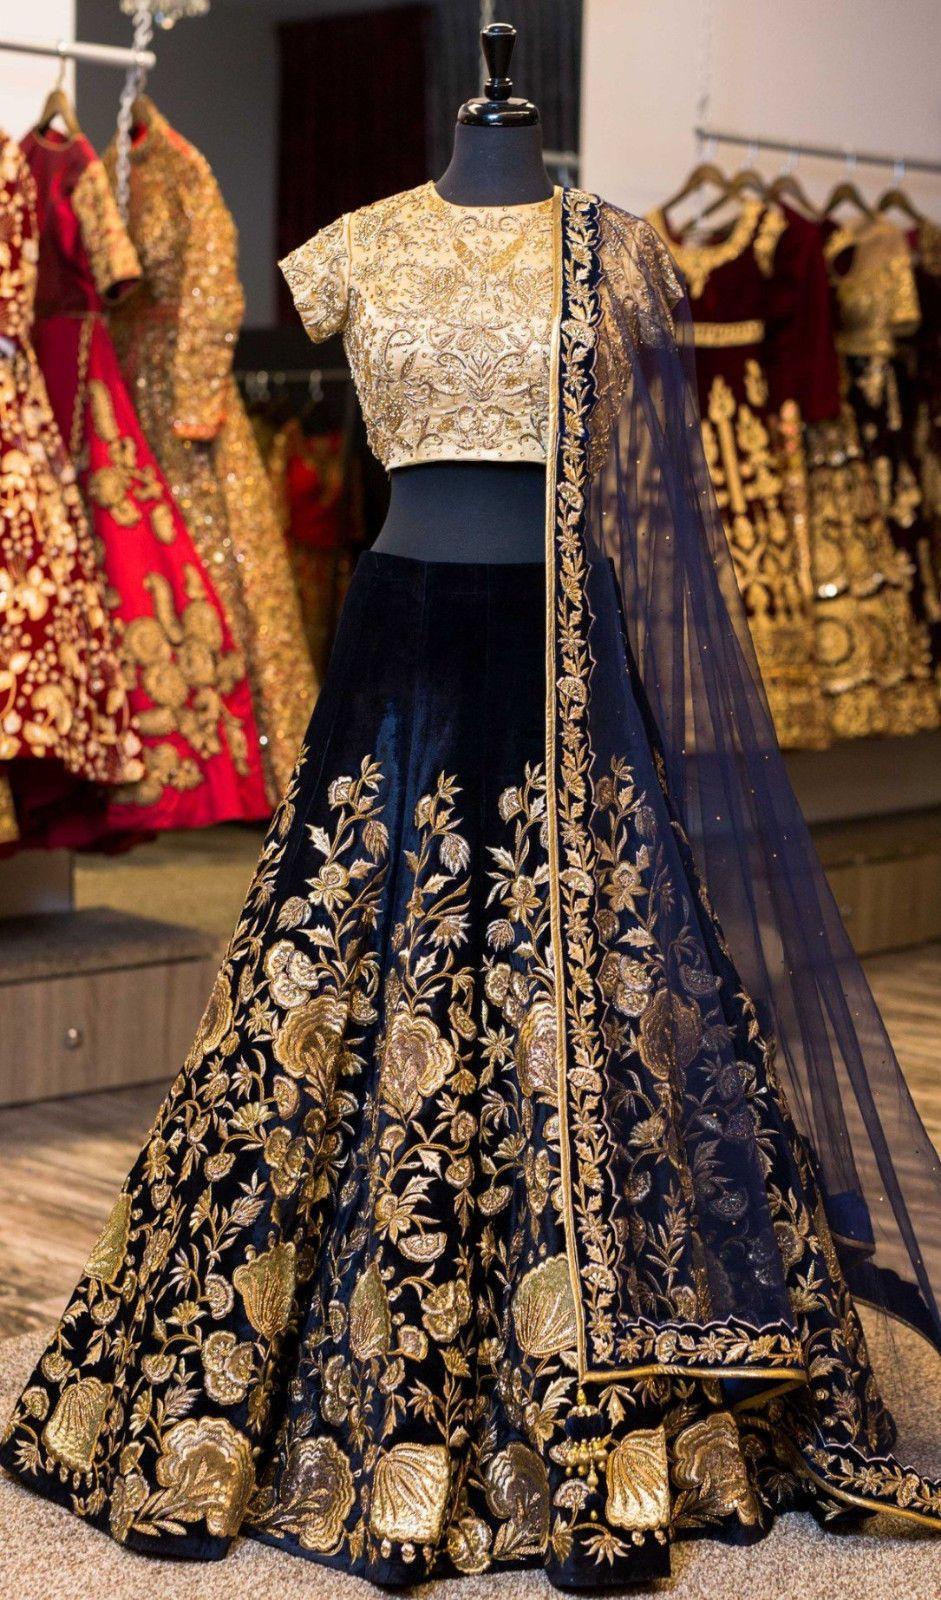 b26475694421 Pakistani Wedding Dresses Online Ebay - raveitsafe